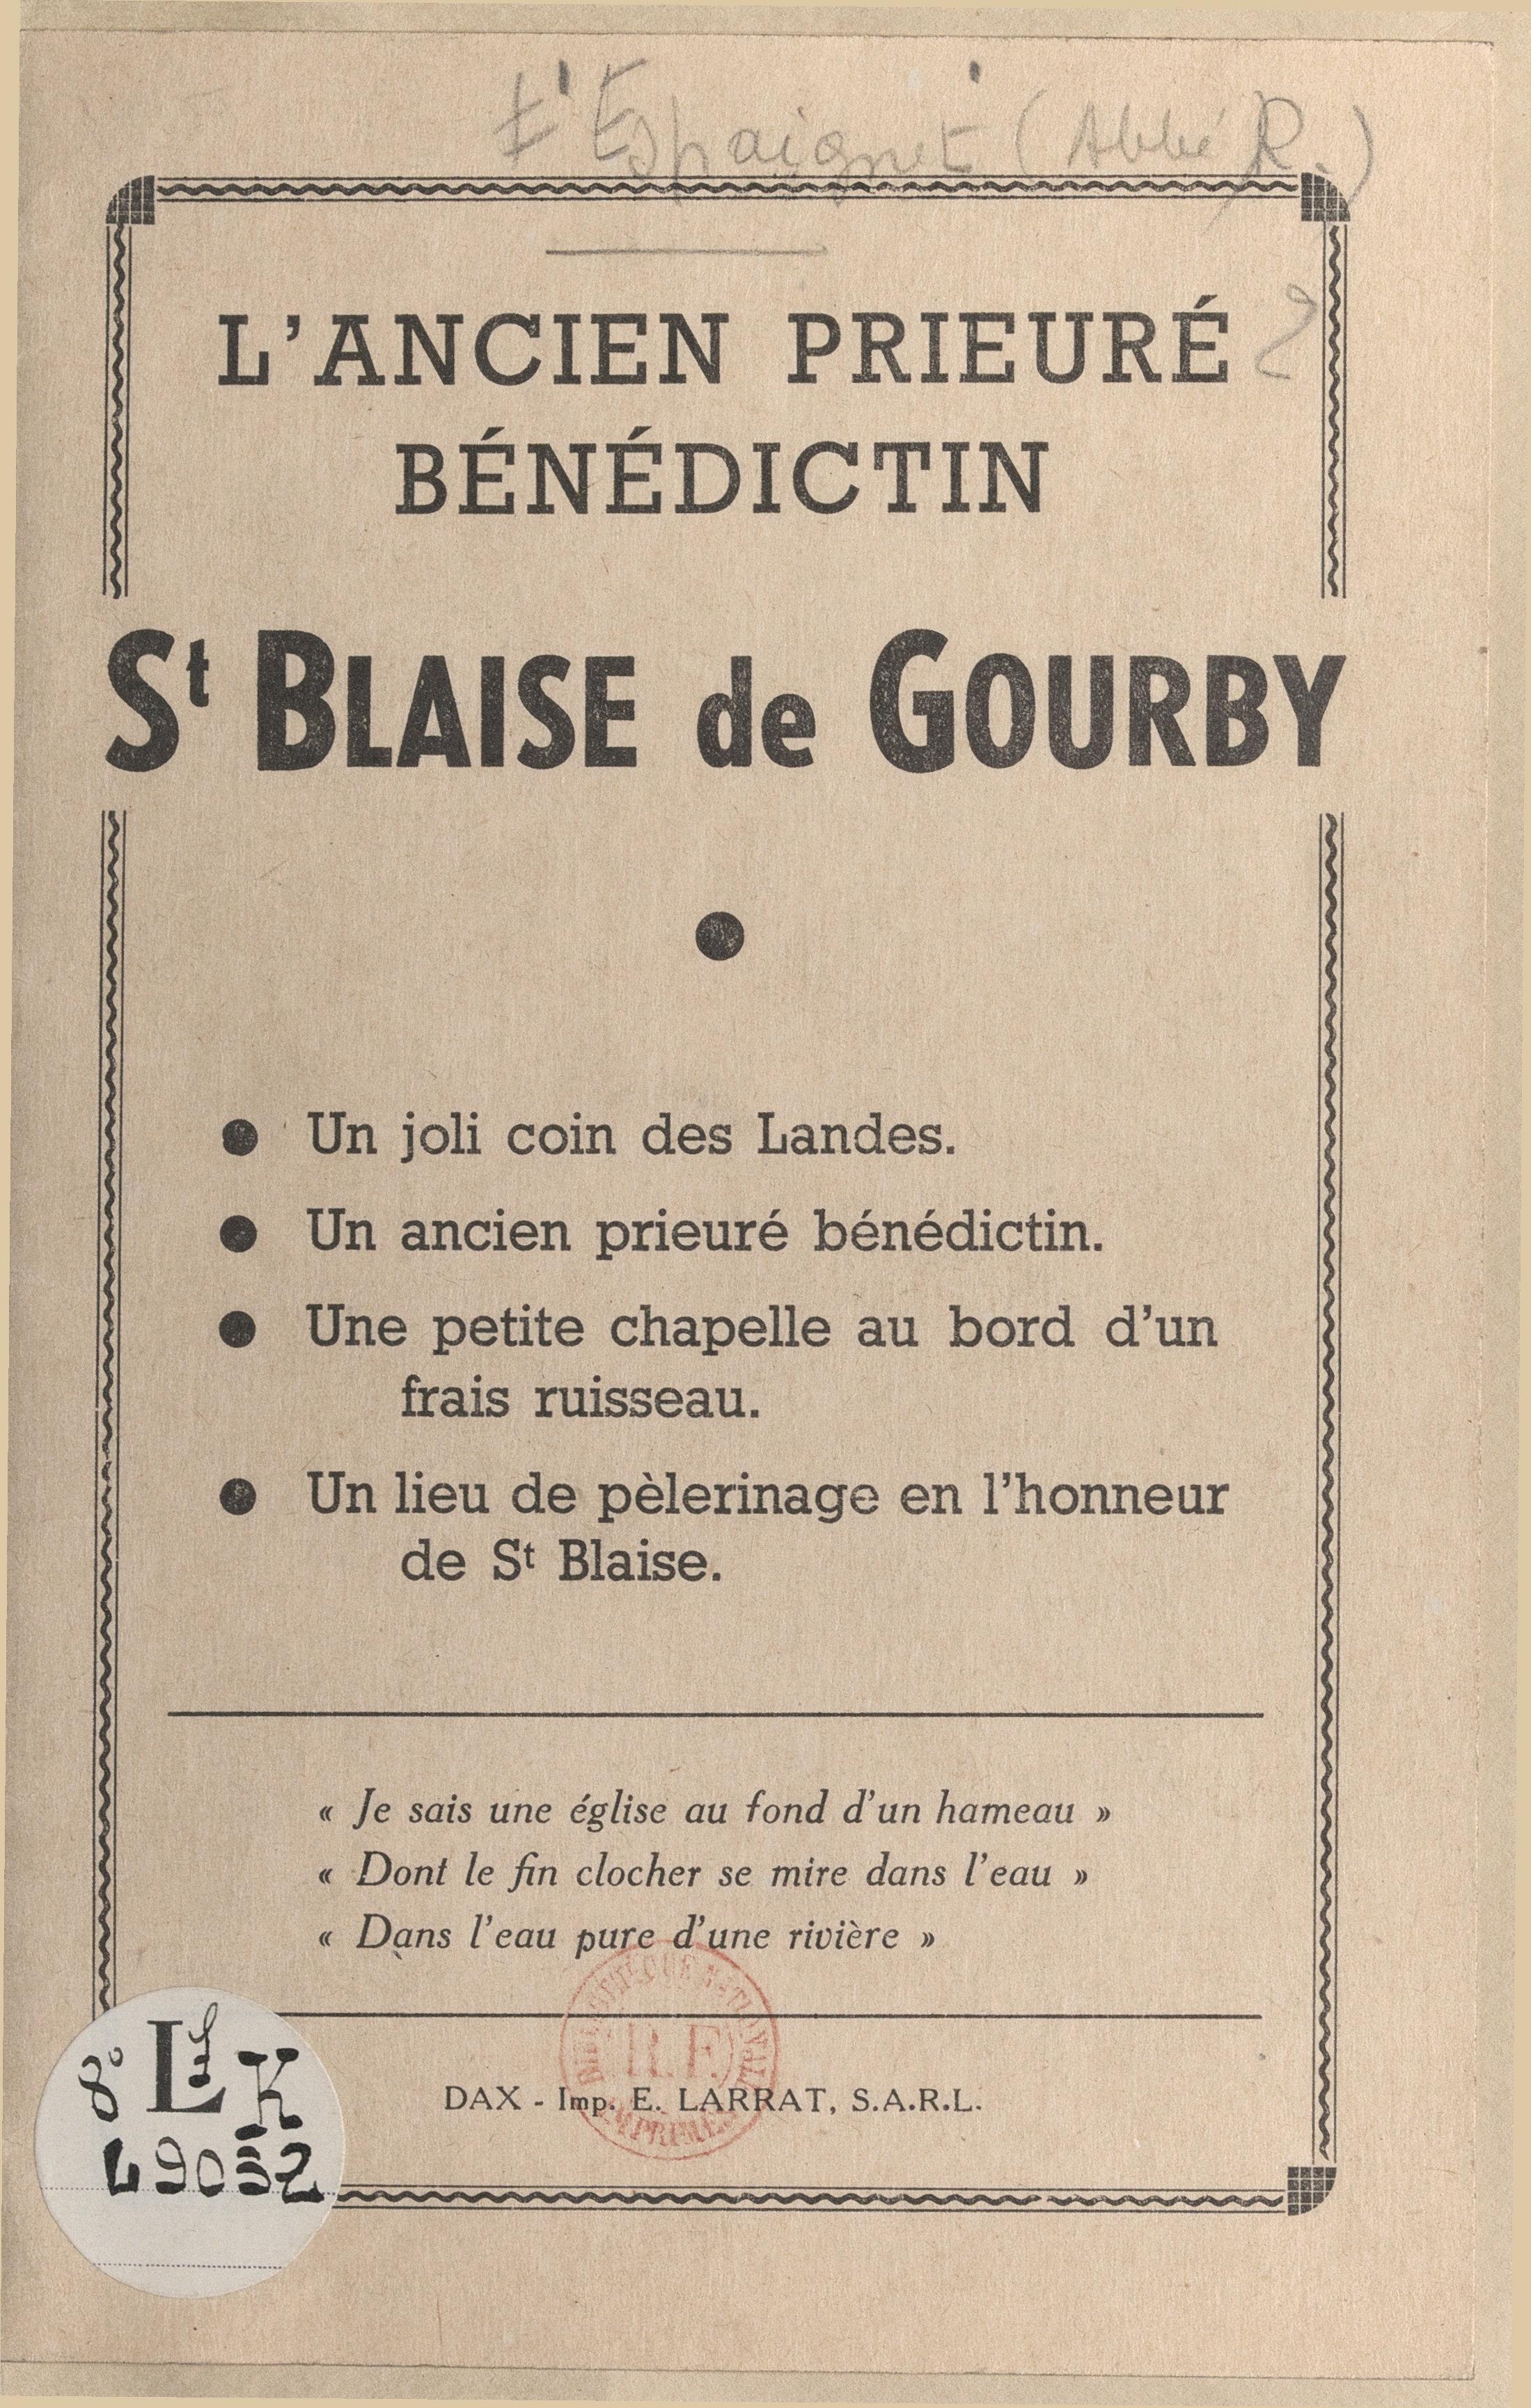 L'ancien prieuré bénédictin...